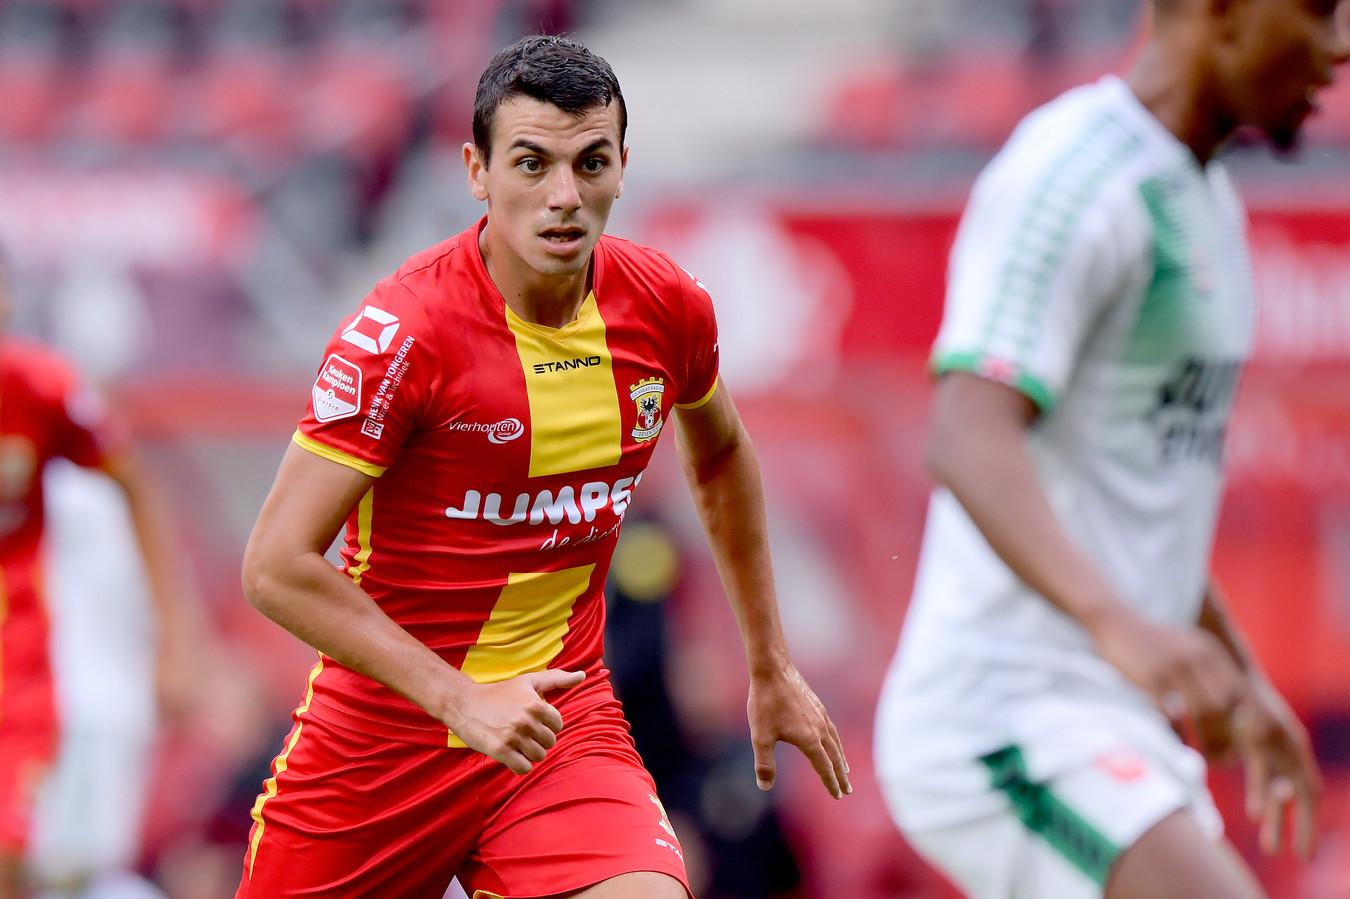 Antoine Rabillard van Go Ahead Eagles